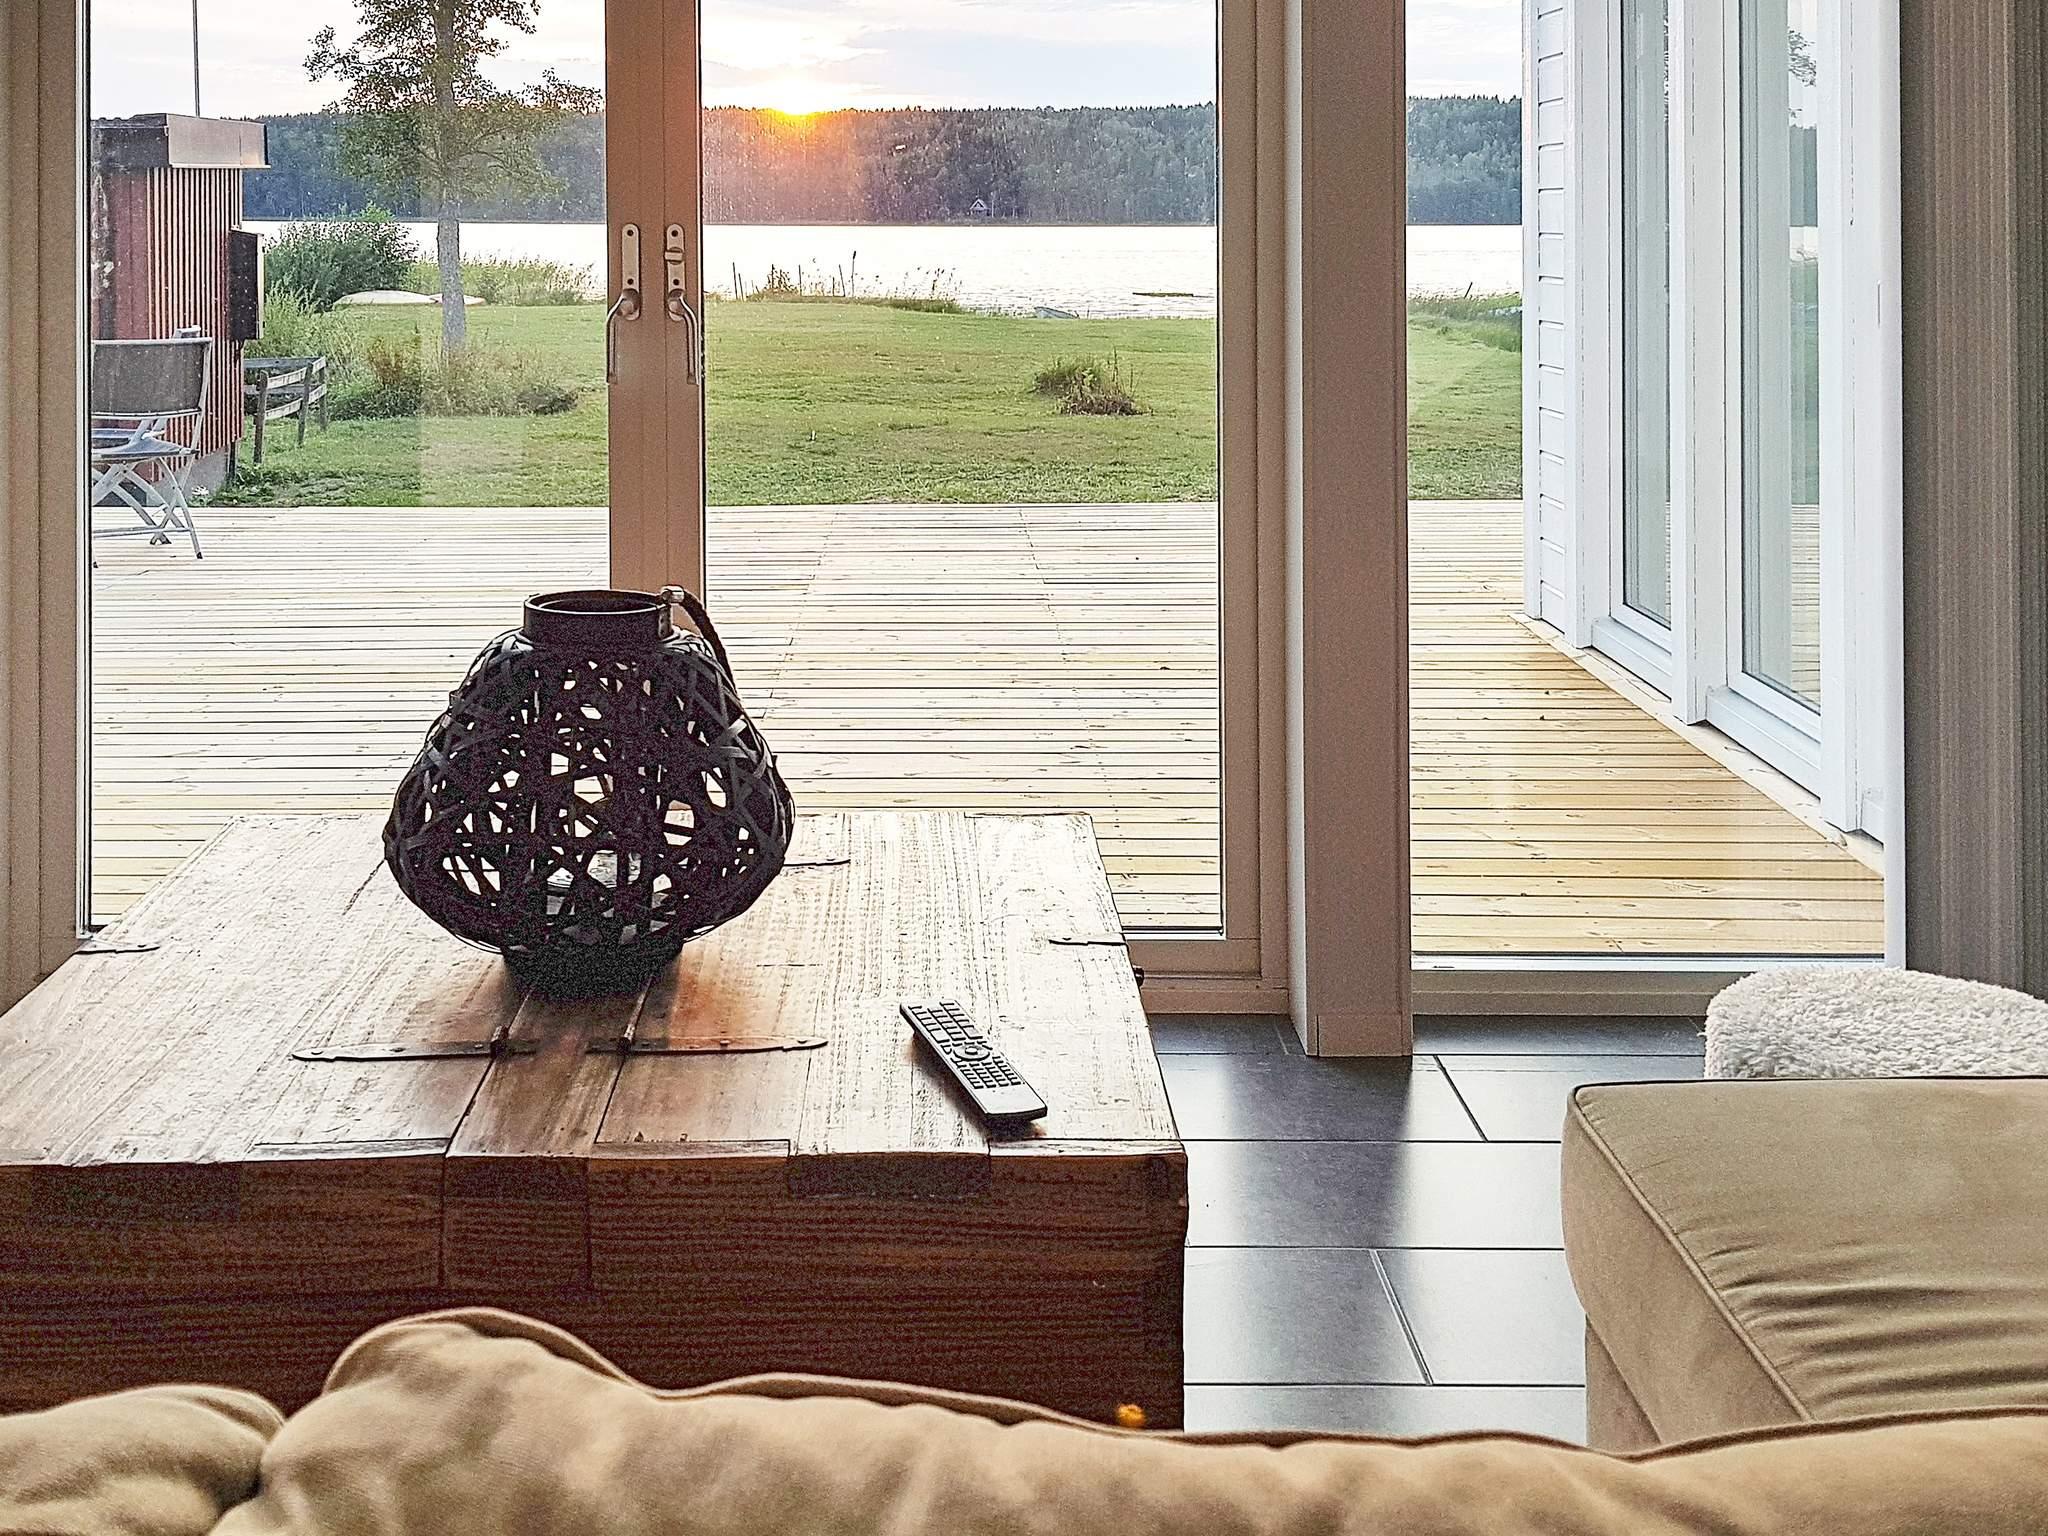 Ferienhaus Melldala (2505595), Lerdala, Västra Götaland län, Westschweden, Schweden, Bild 17